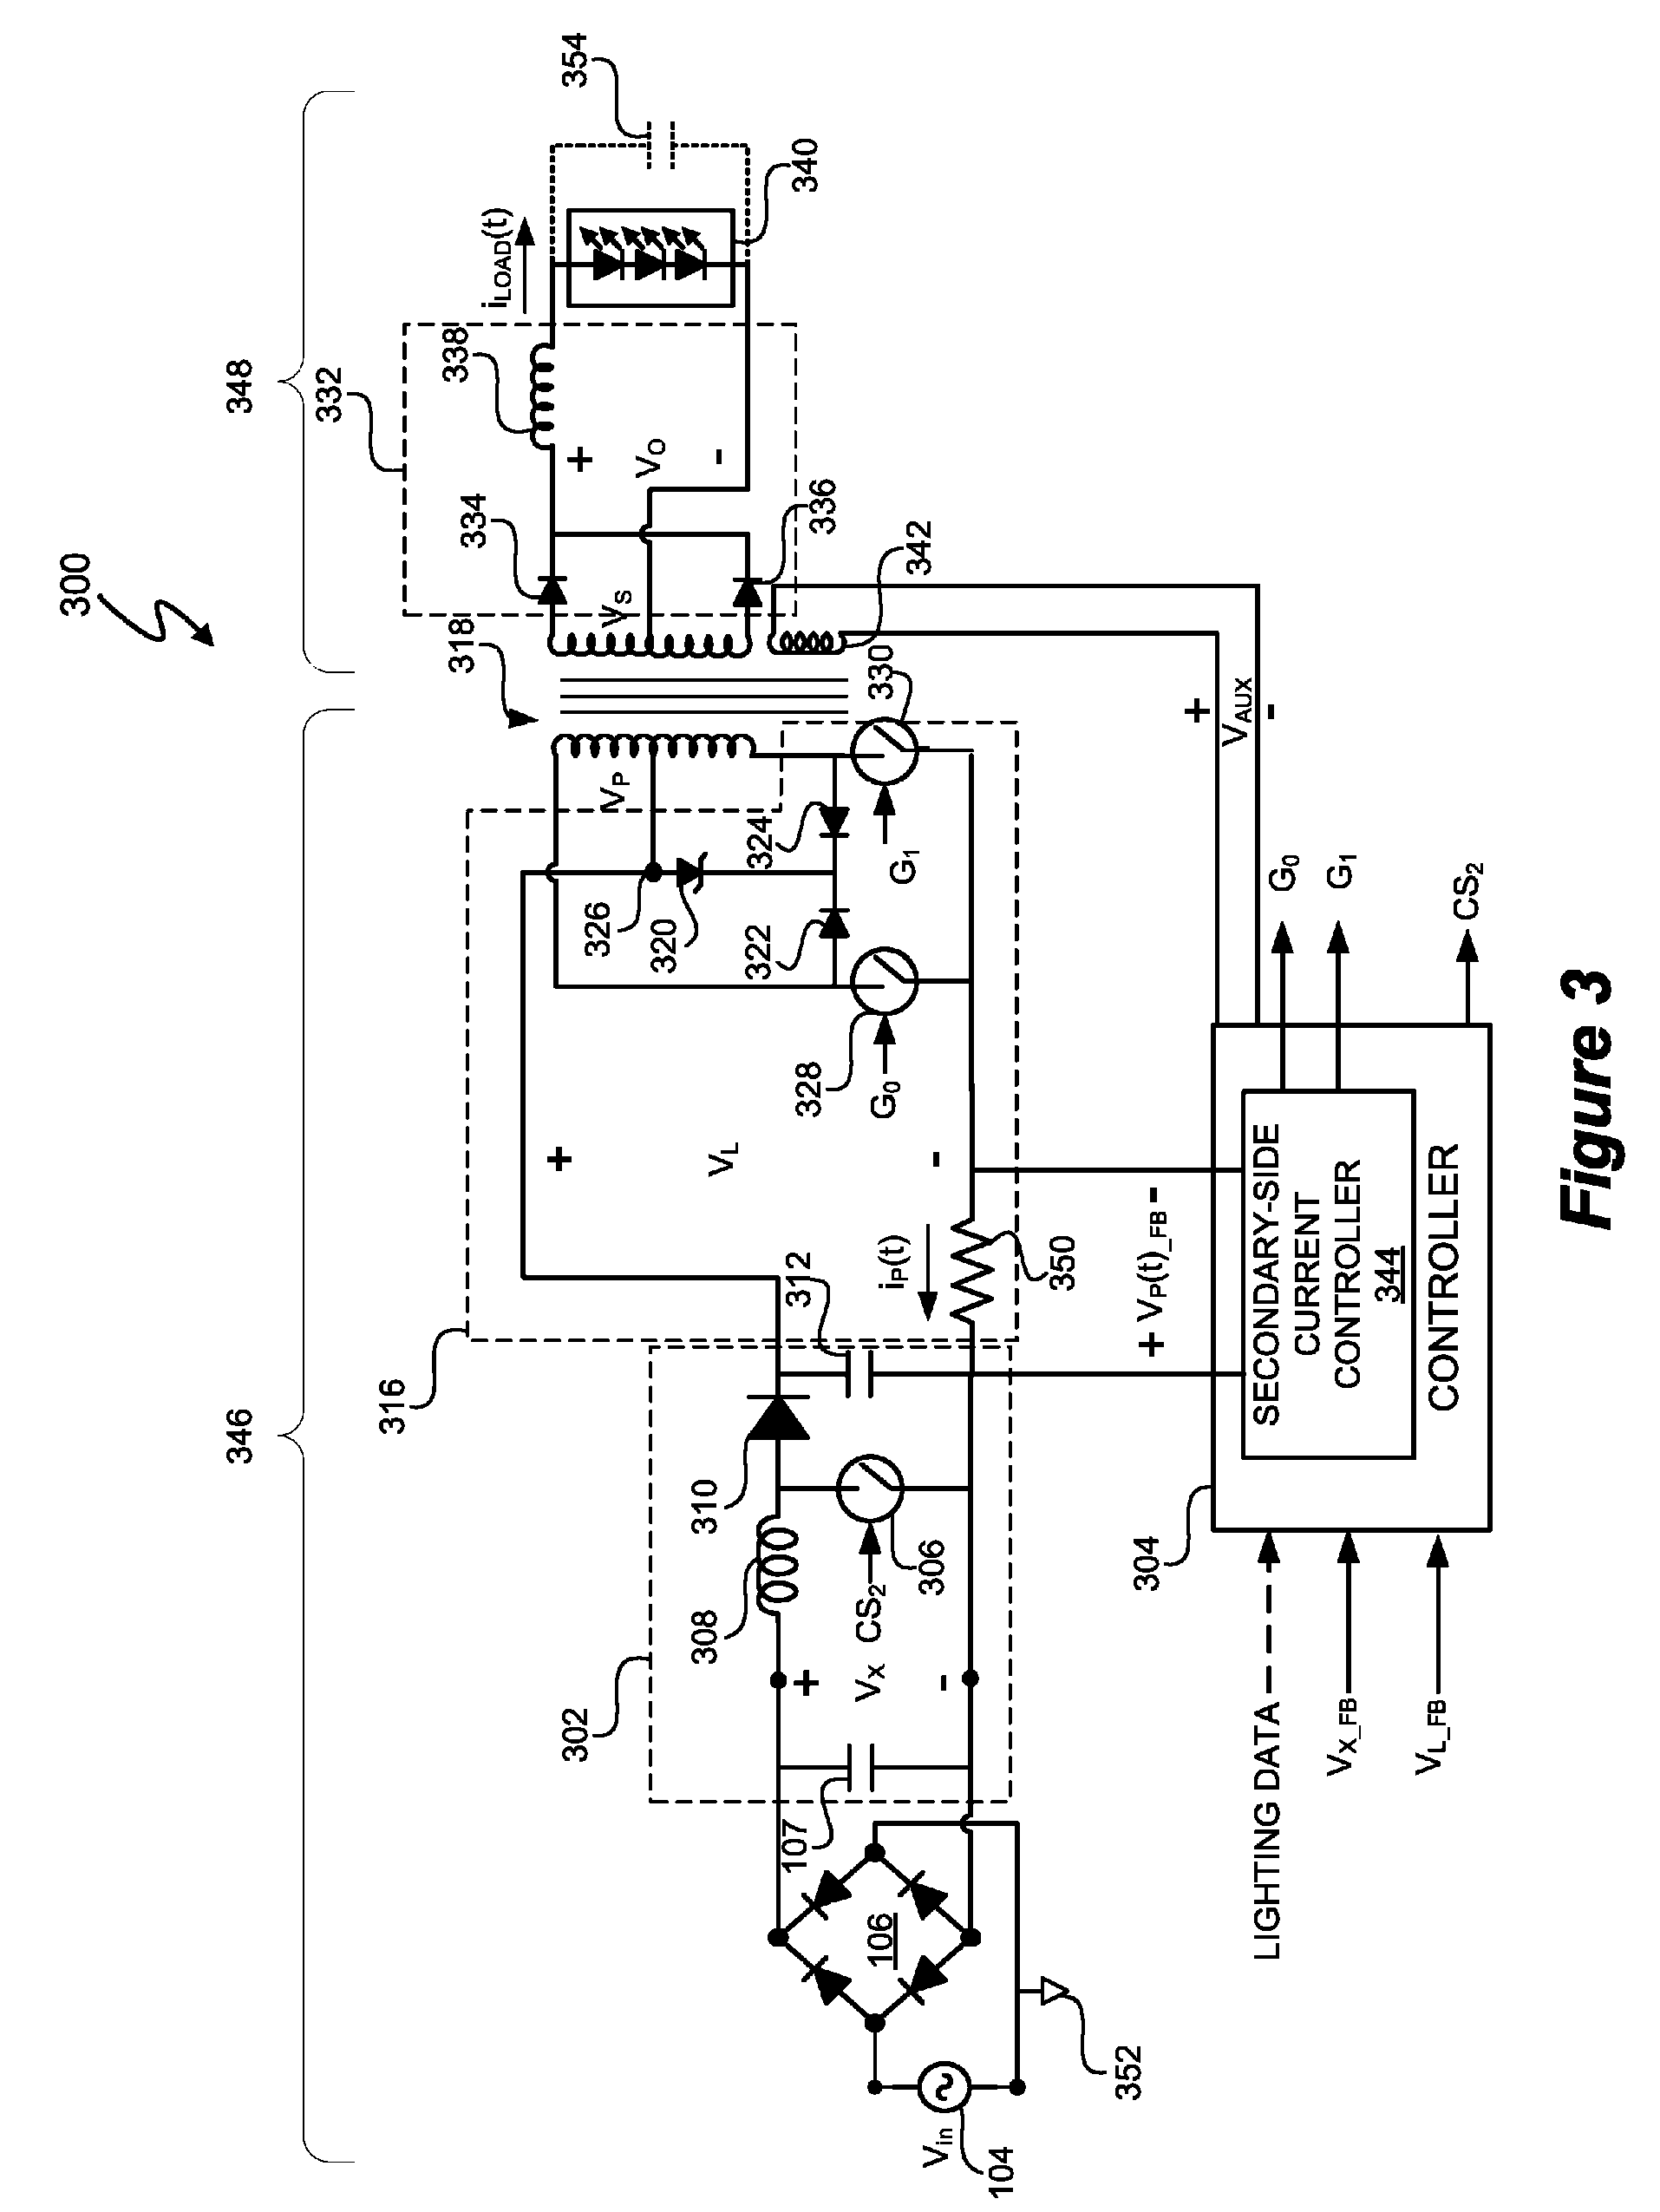 sym cdi ignition wiring diagram data flow process, Wiring diagram